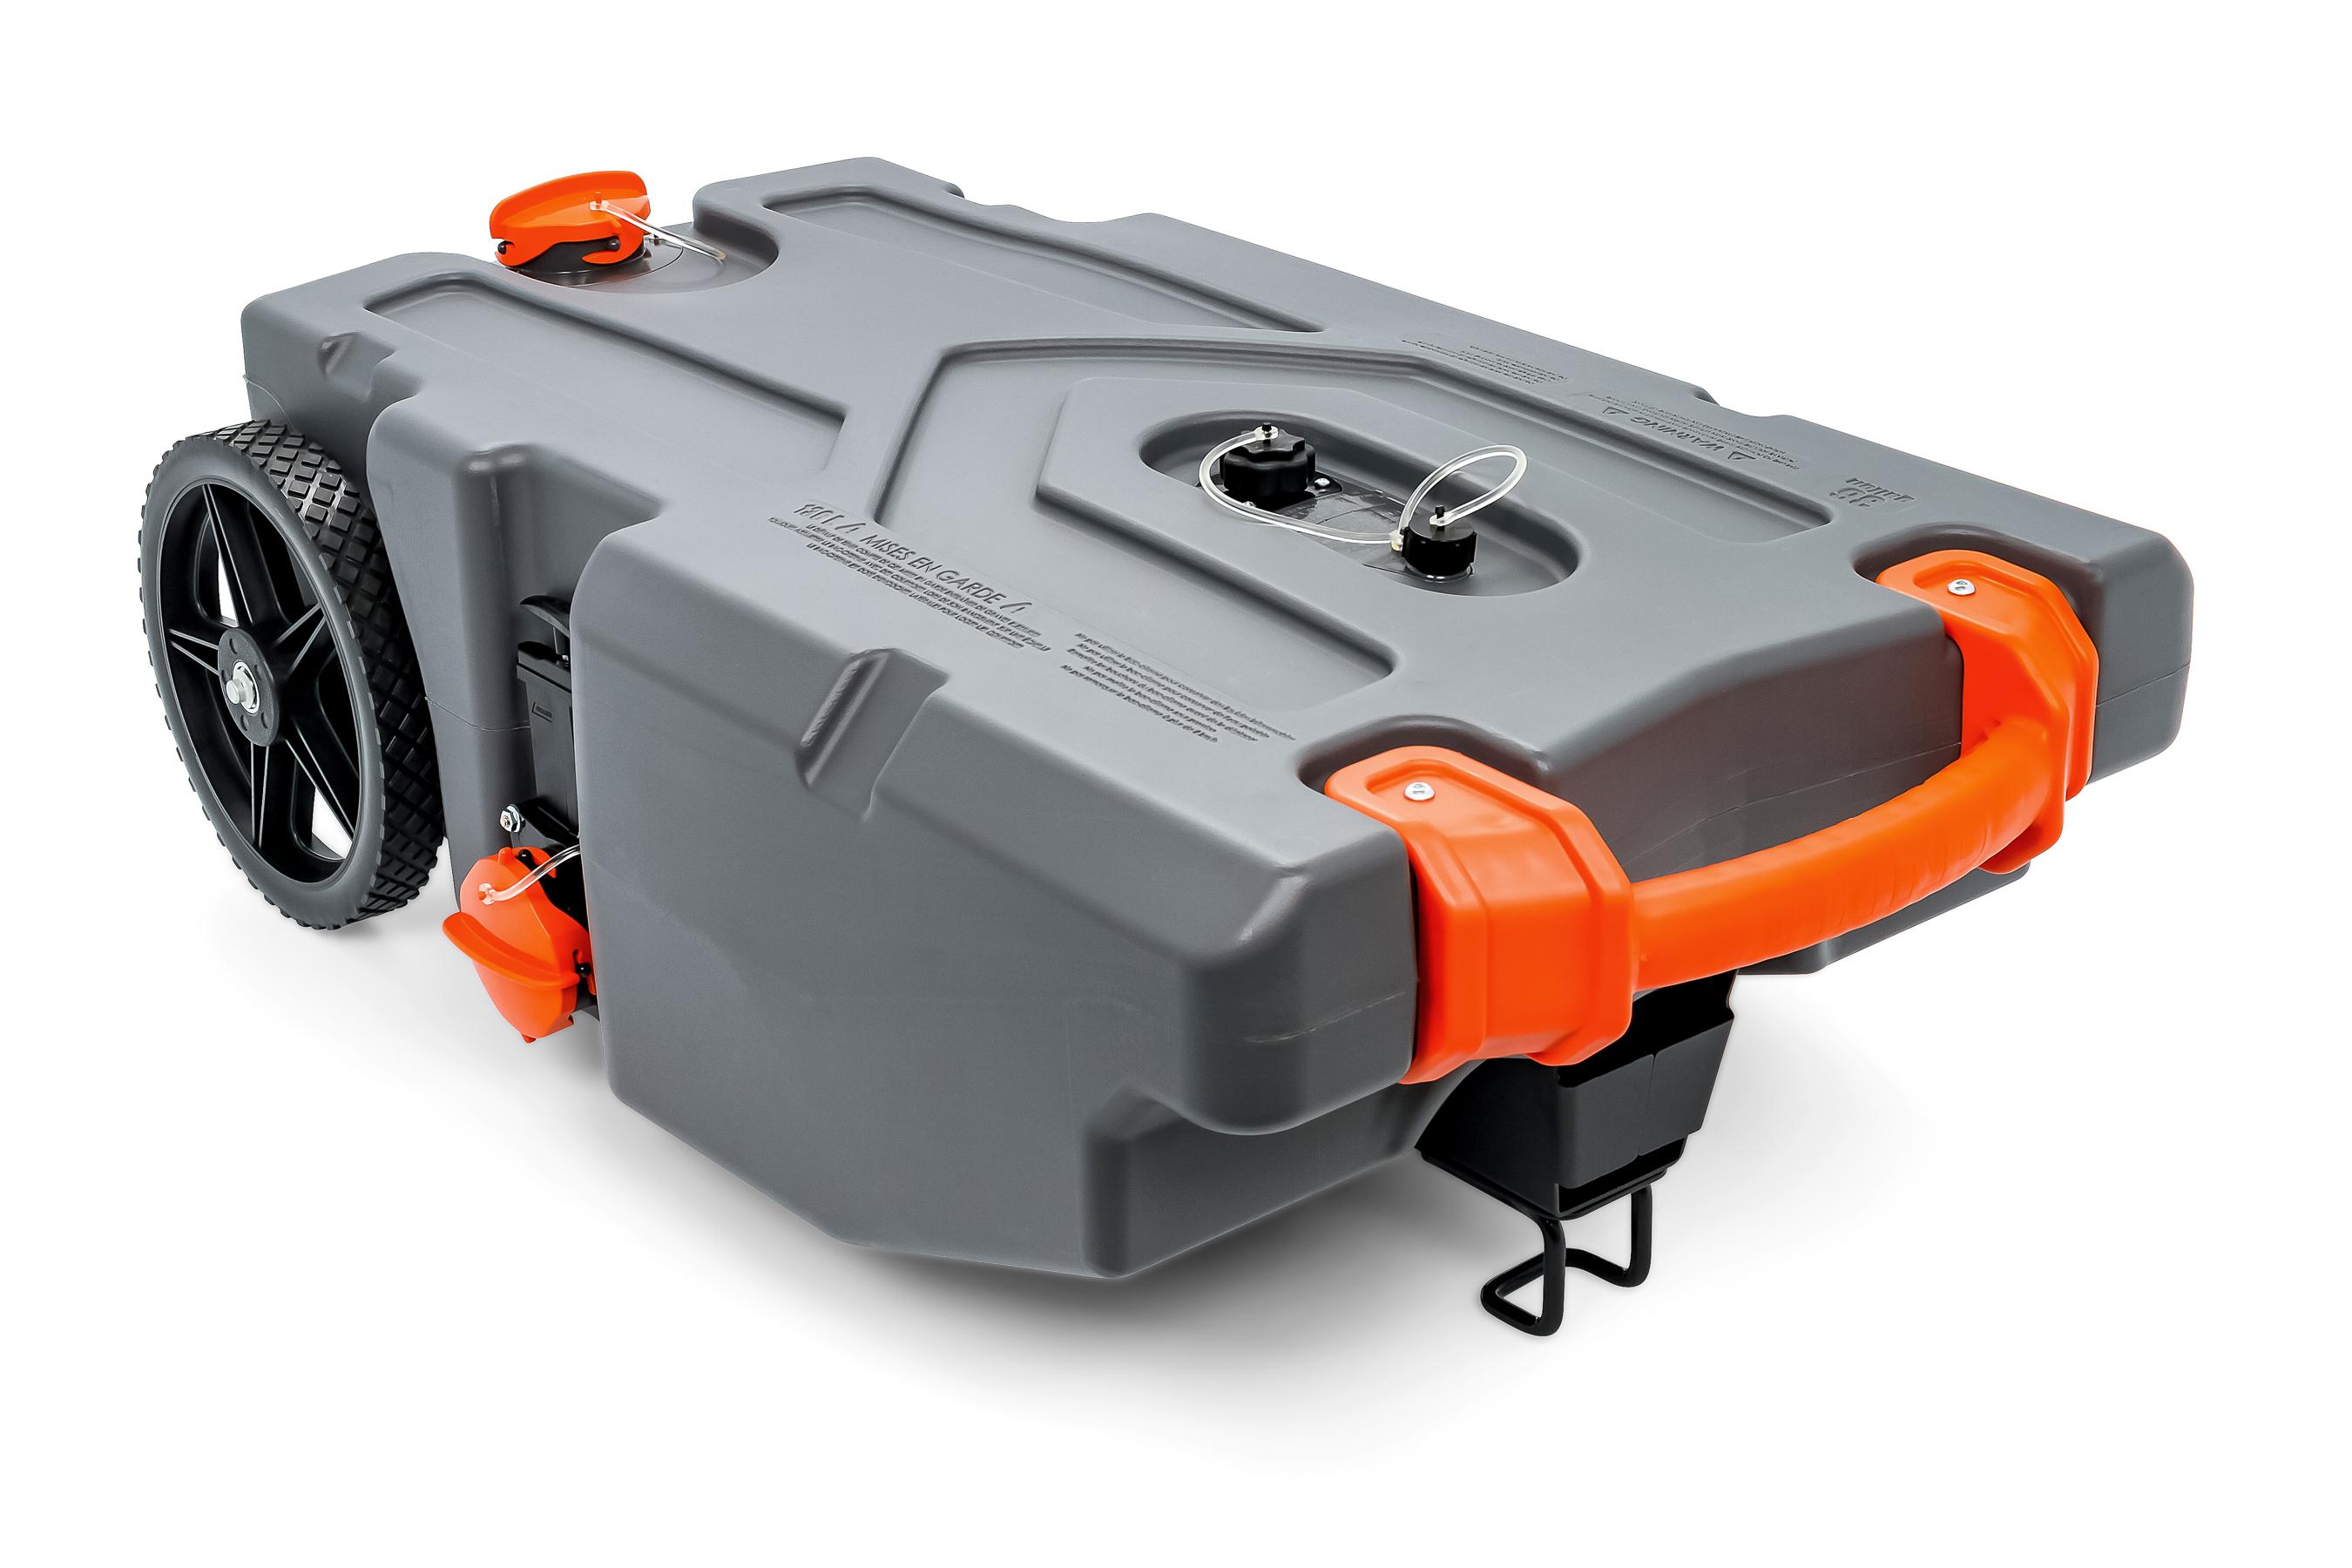 Camco 36-Gallon Rhino Portable RV Waste Holding Tank